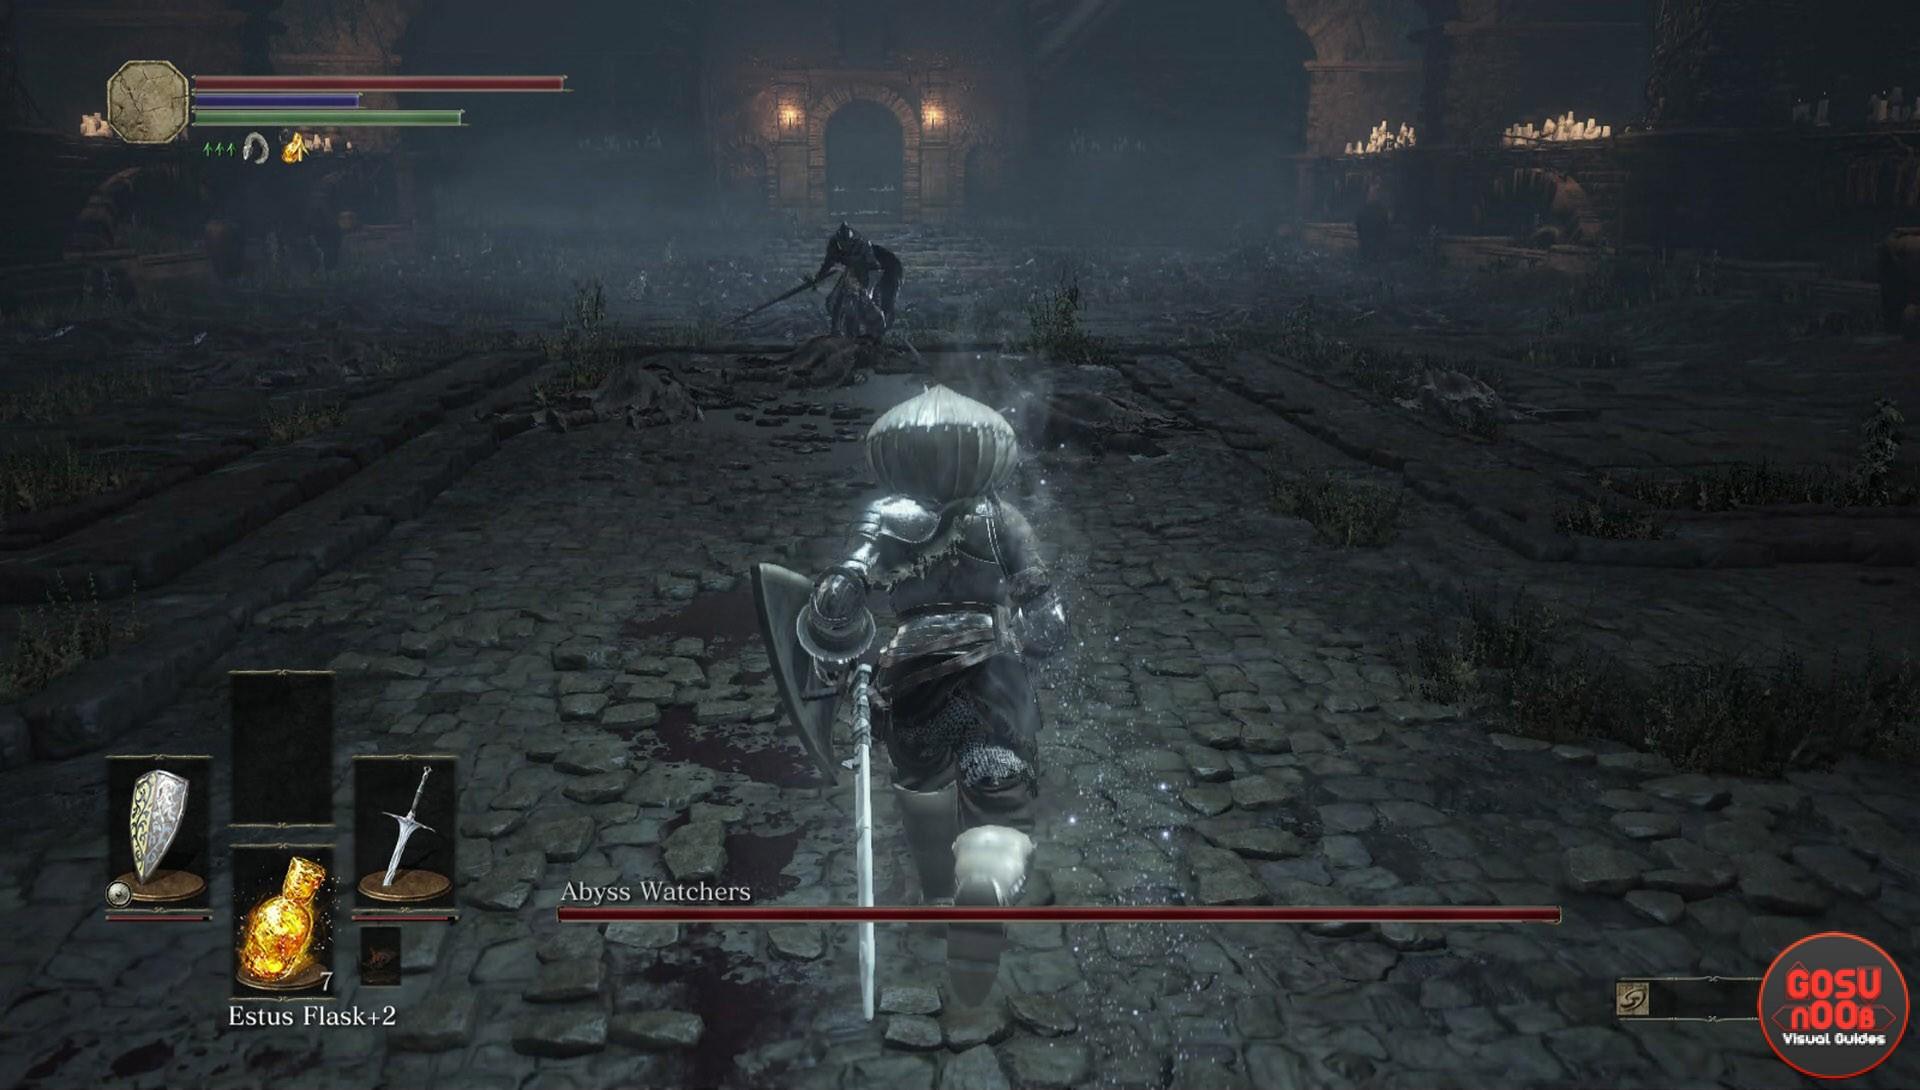 abyss watchers boss guide dark souls 3